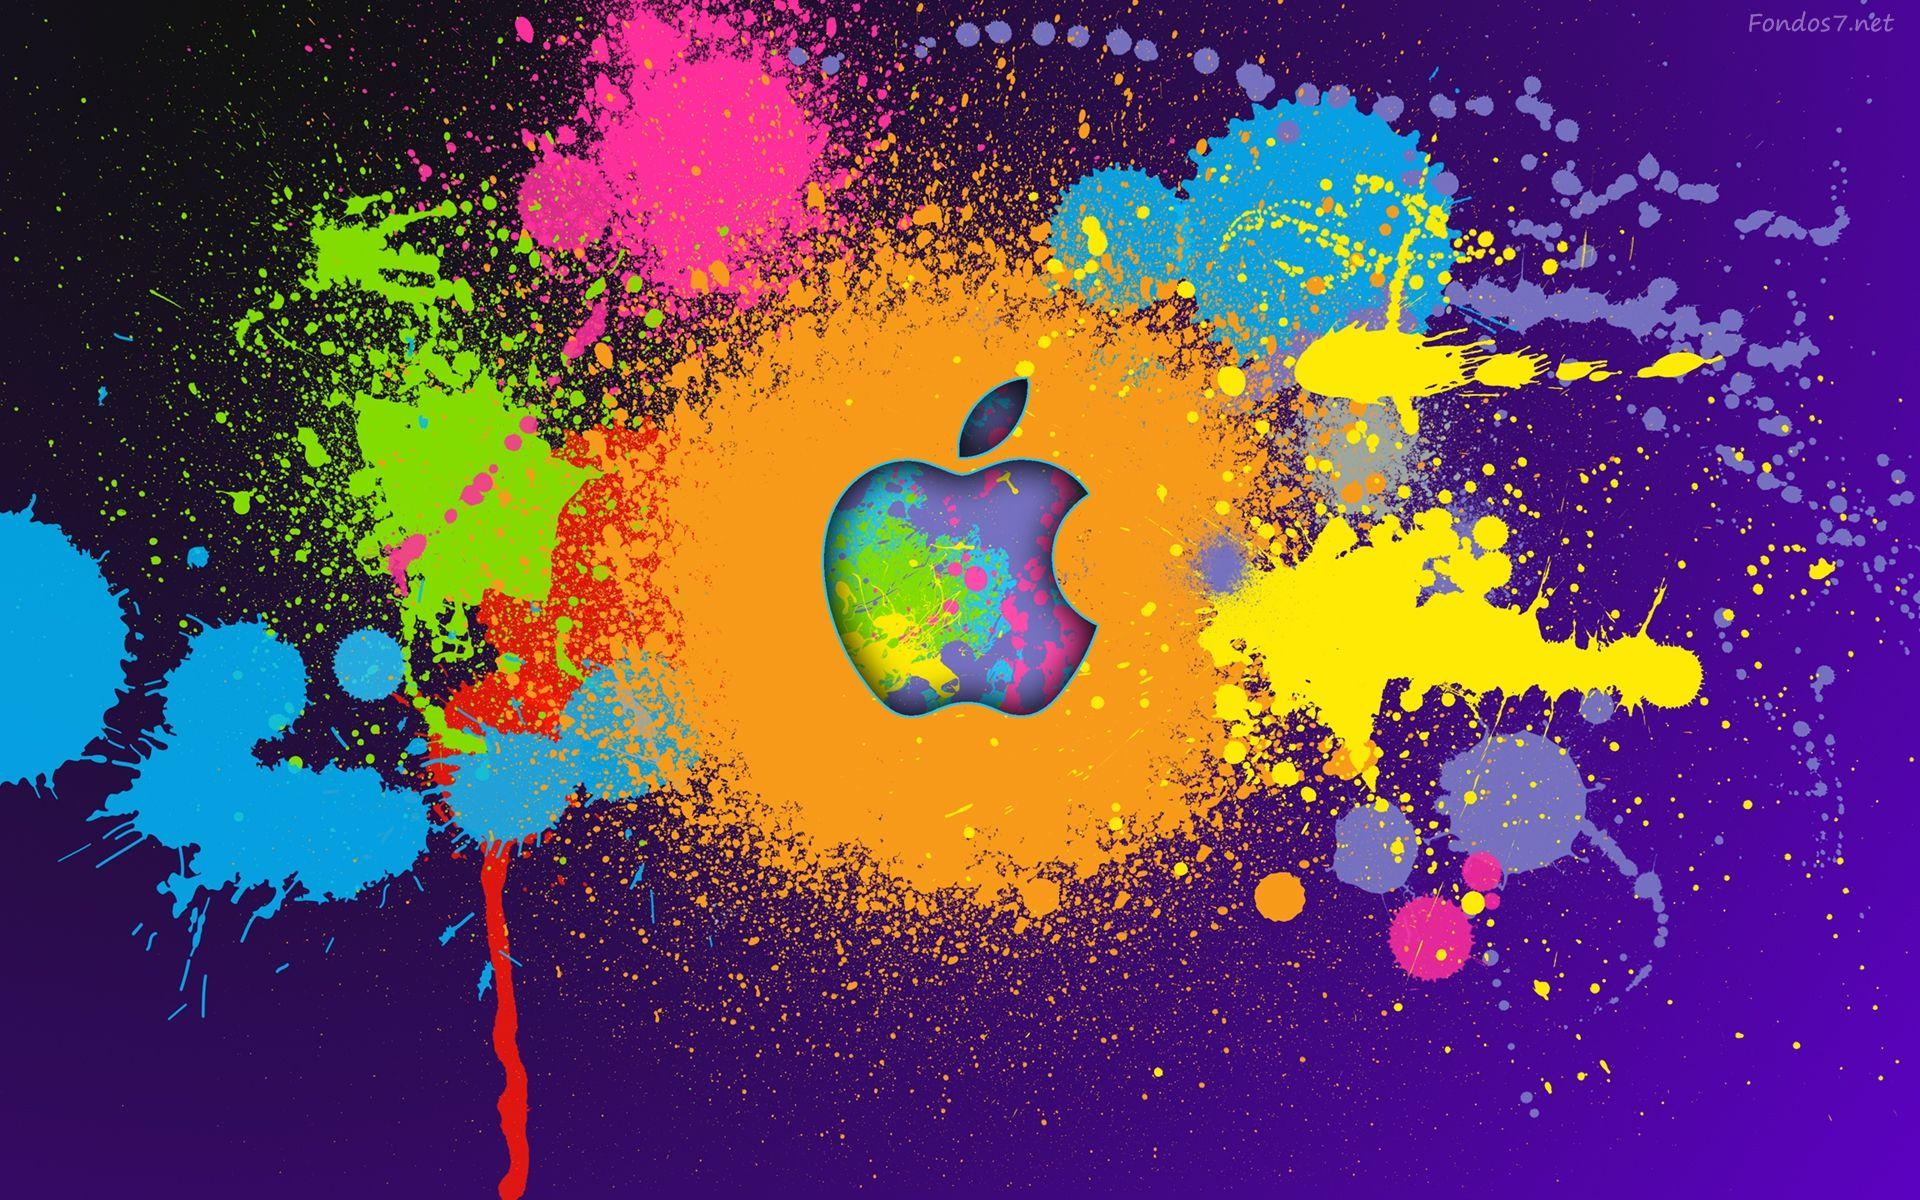 Most Inspiring Wallpaper Mac Art - 3ac6429b093f6e6511731a8fc795e00b  Best Photo Reference_99254.jpg